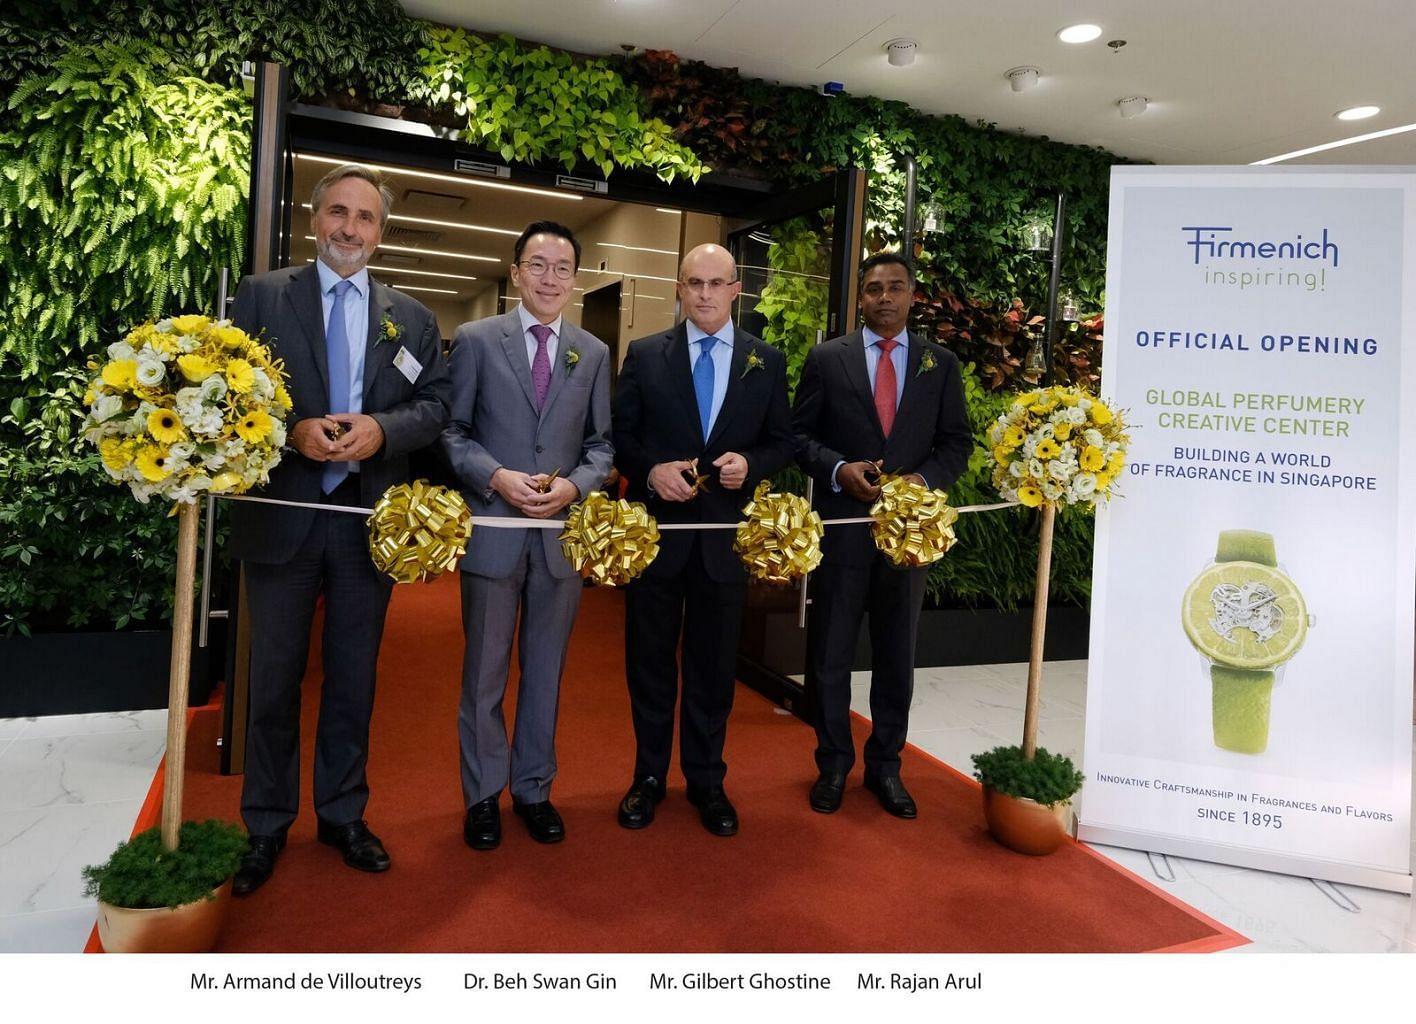 Swiss fragrance company Firmenich expands Singapore presence